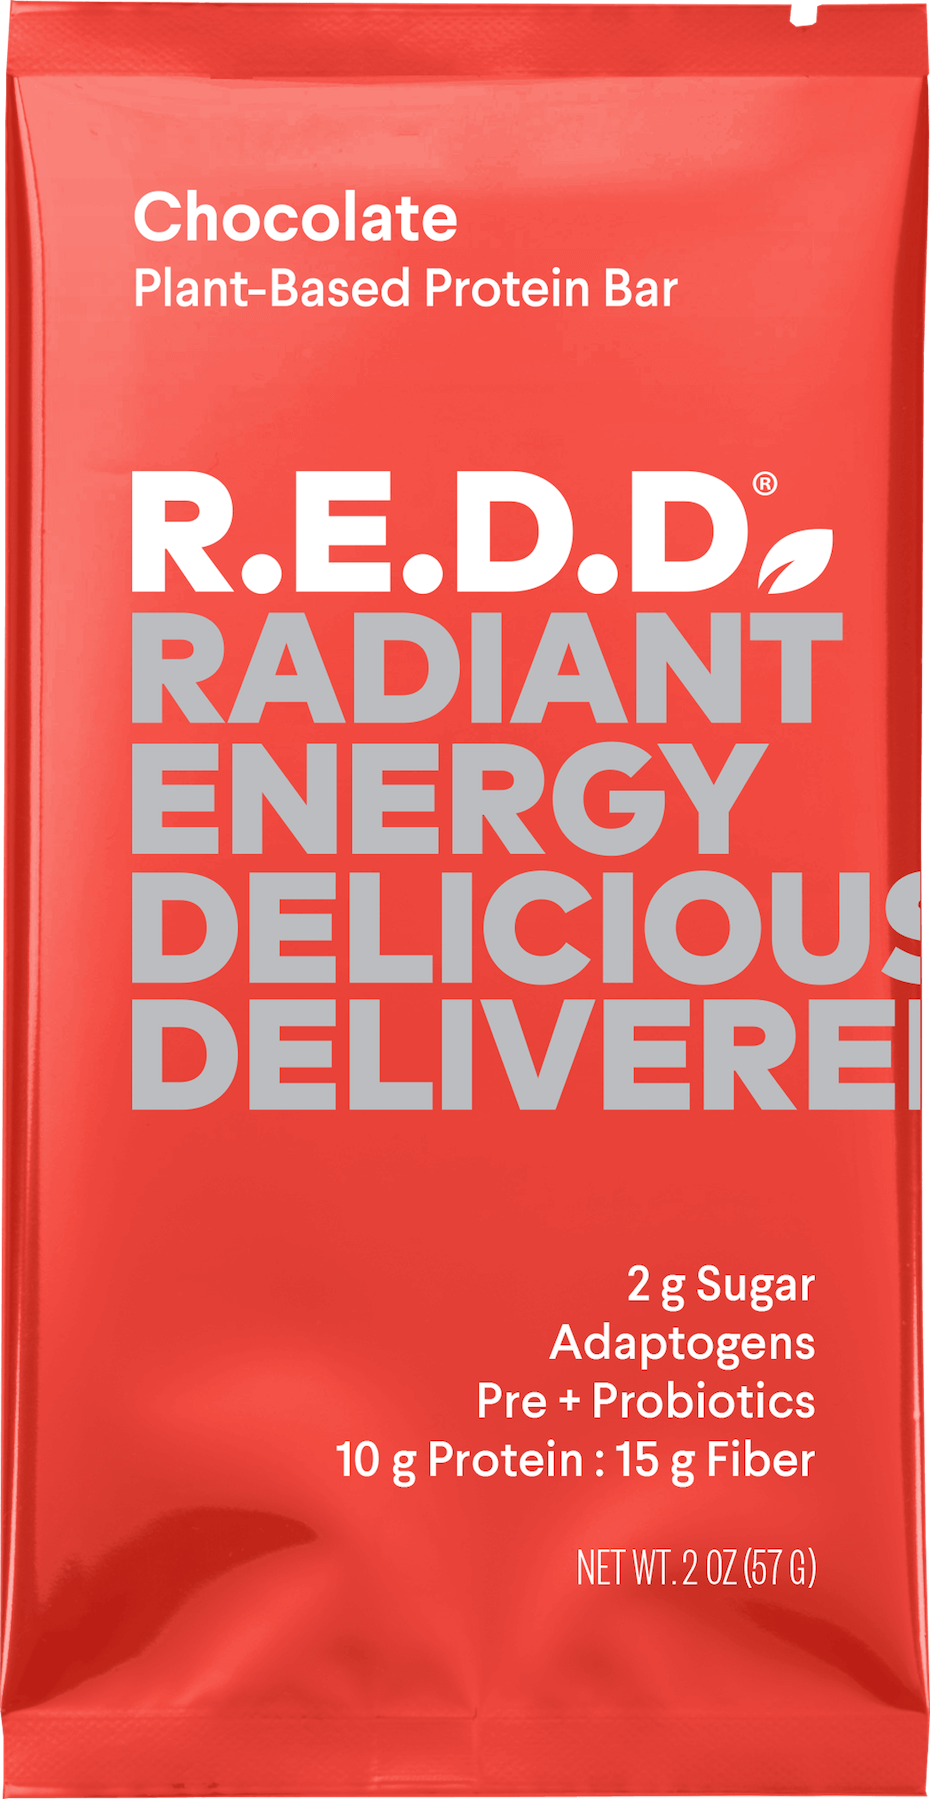 REDD chocolate protein bar